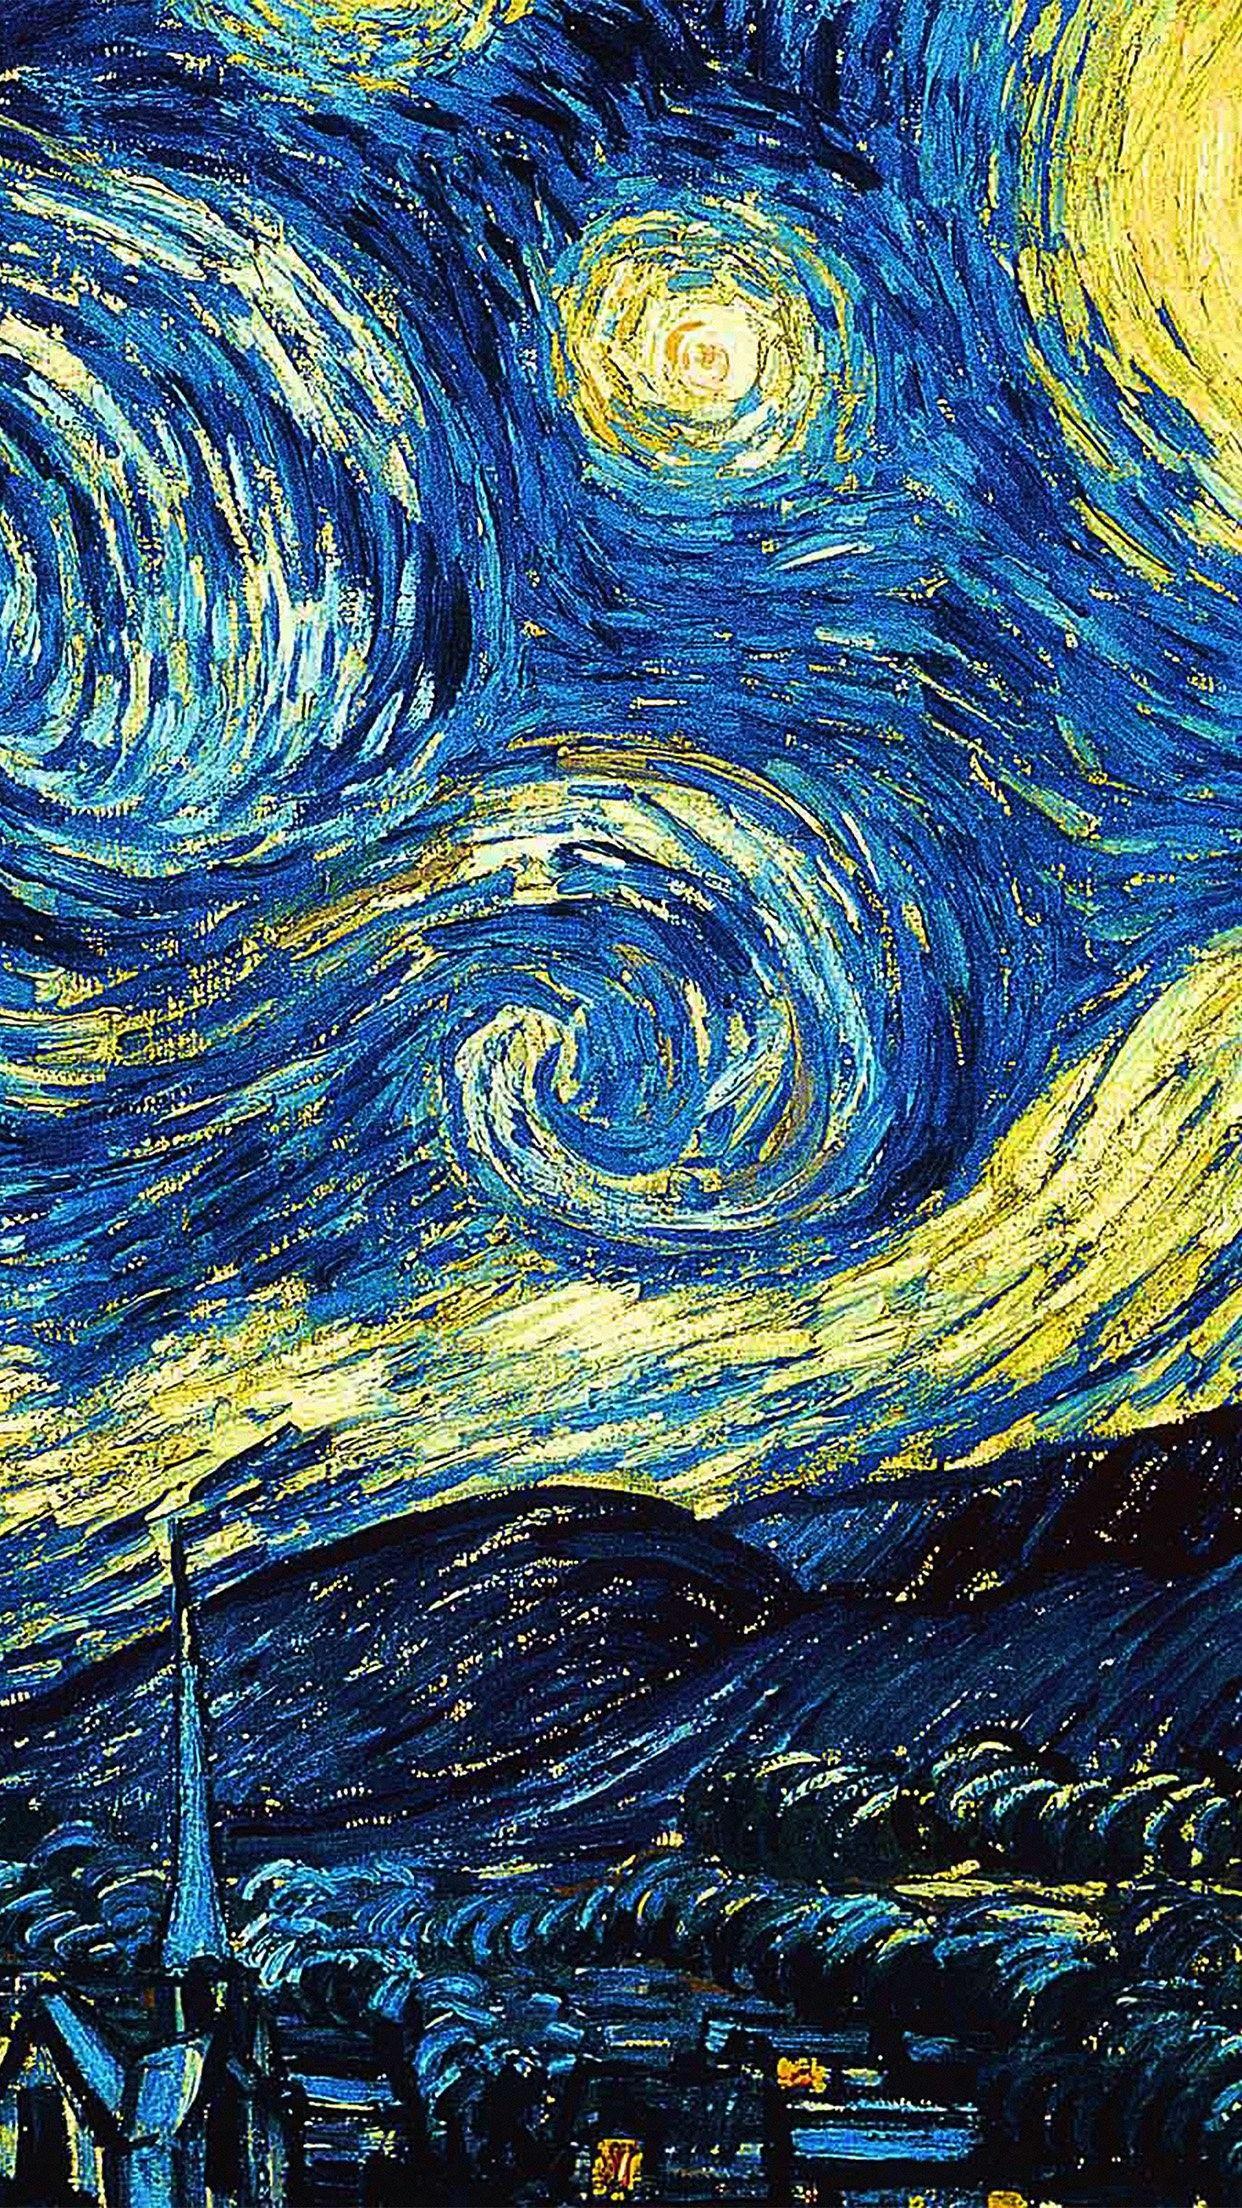 54 Van Gogh Wallpapers On Wallpaperplay Starry Night Van Gogh Van Gogh Wallpaper Starry Night Art